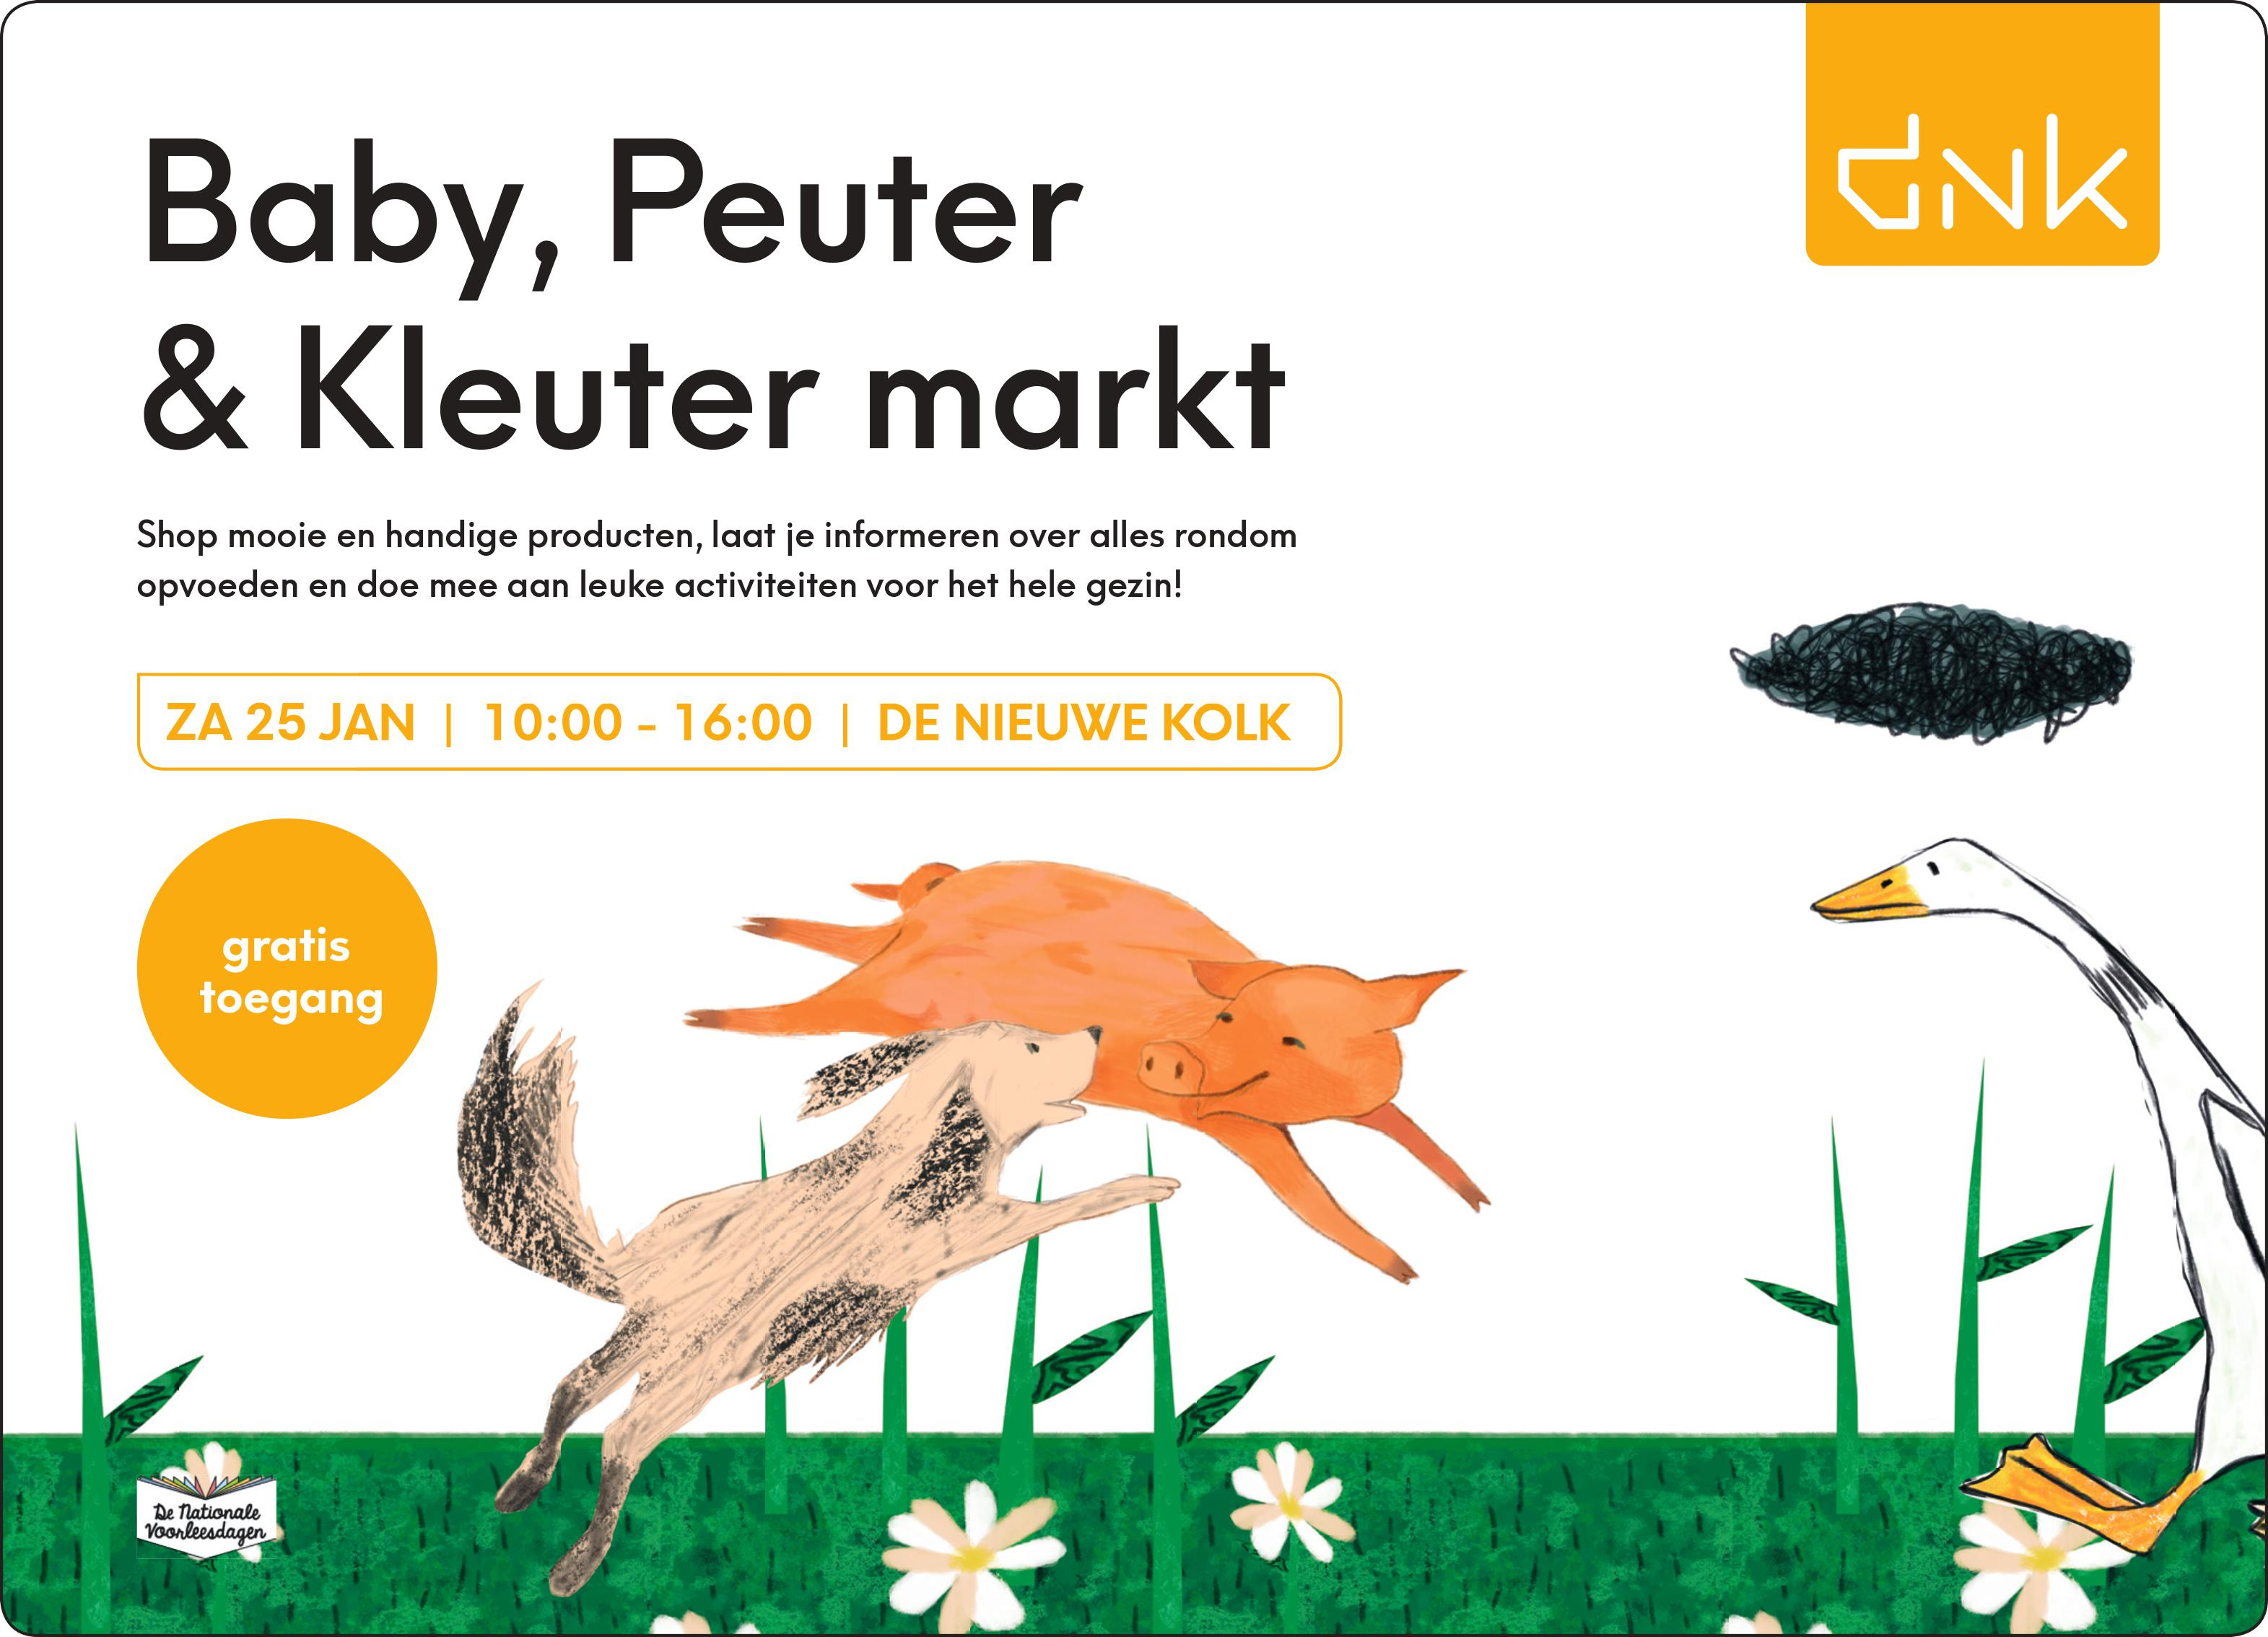 Baby, peuter & kleutermarkt DNK Assen - Kids First COP groep